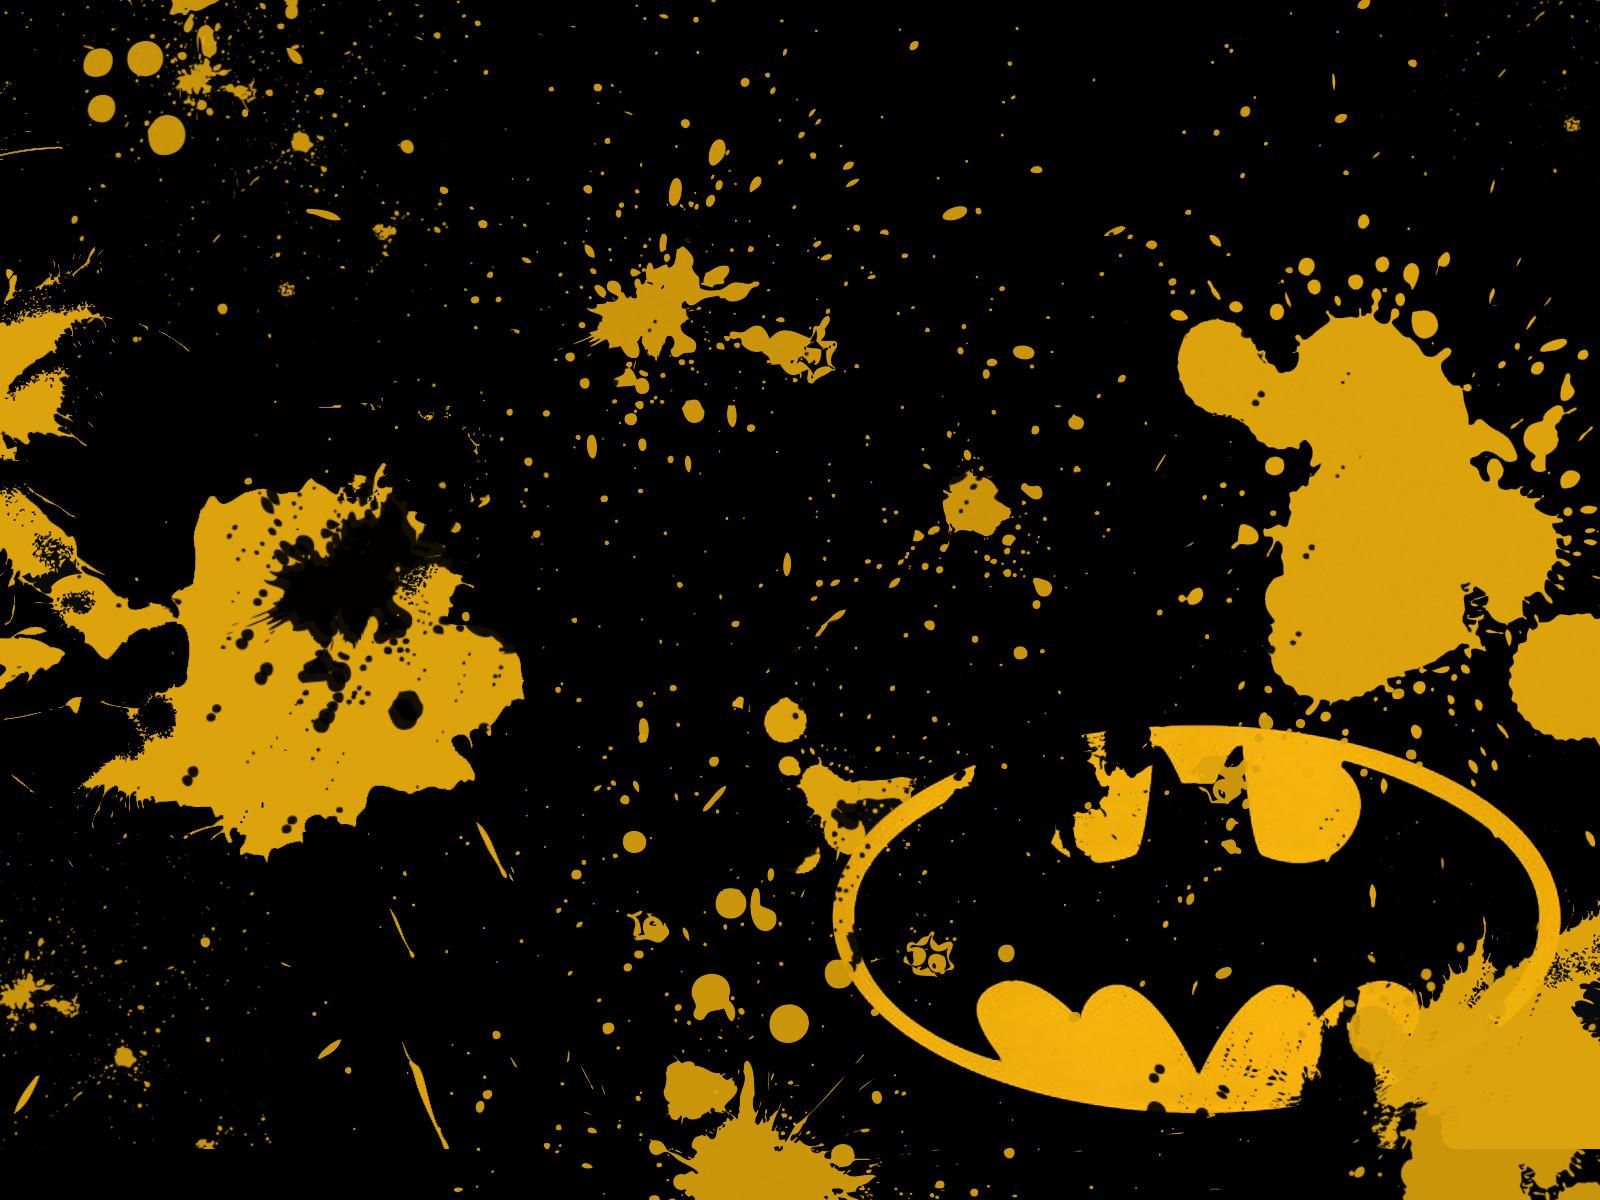 50 Batman Logo wallpapers For Download HD 1080p 1600x1200